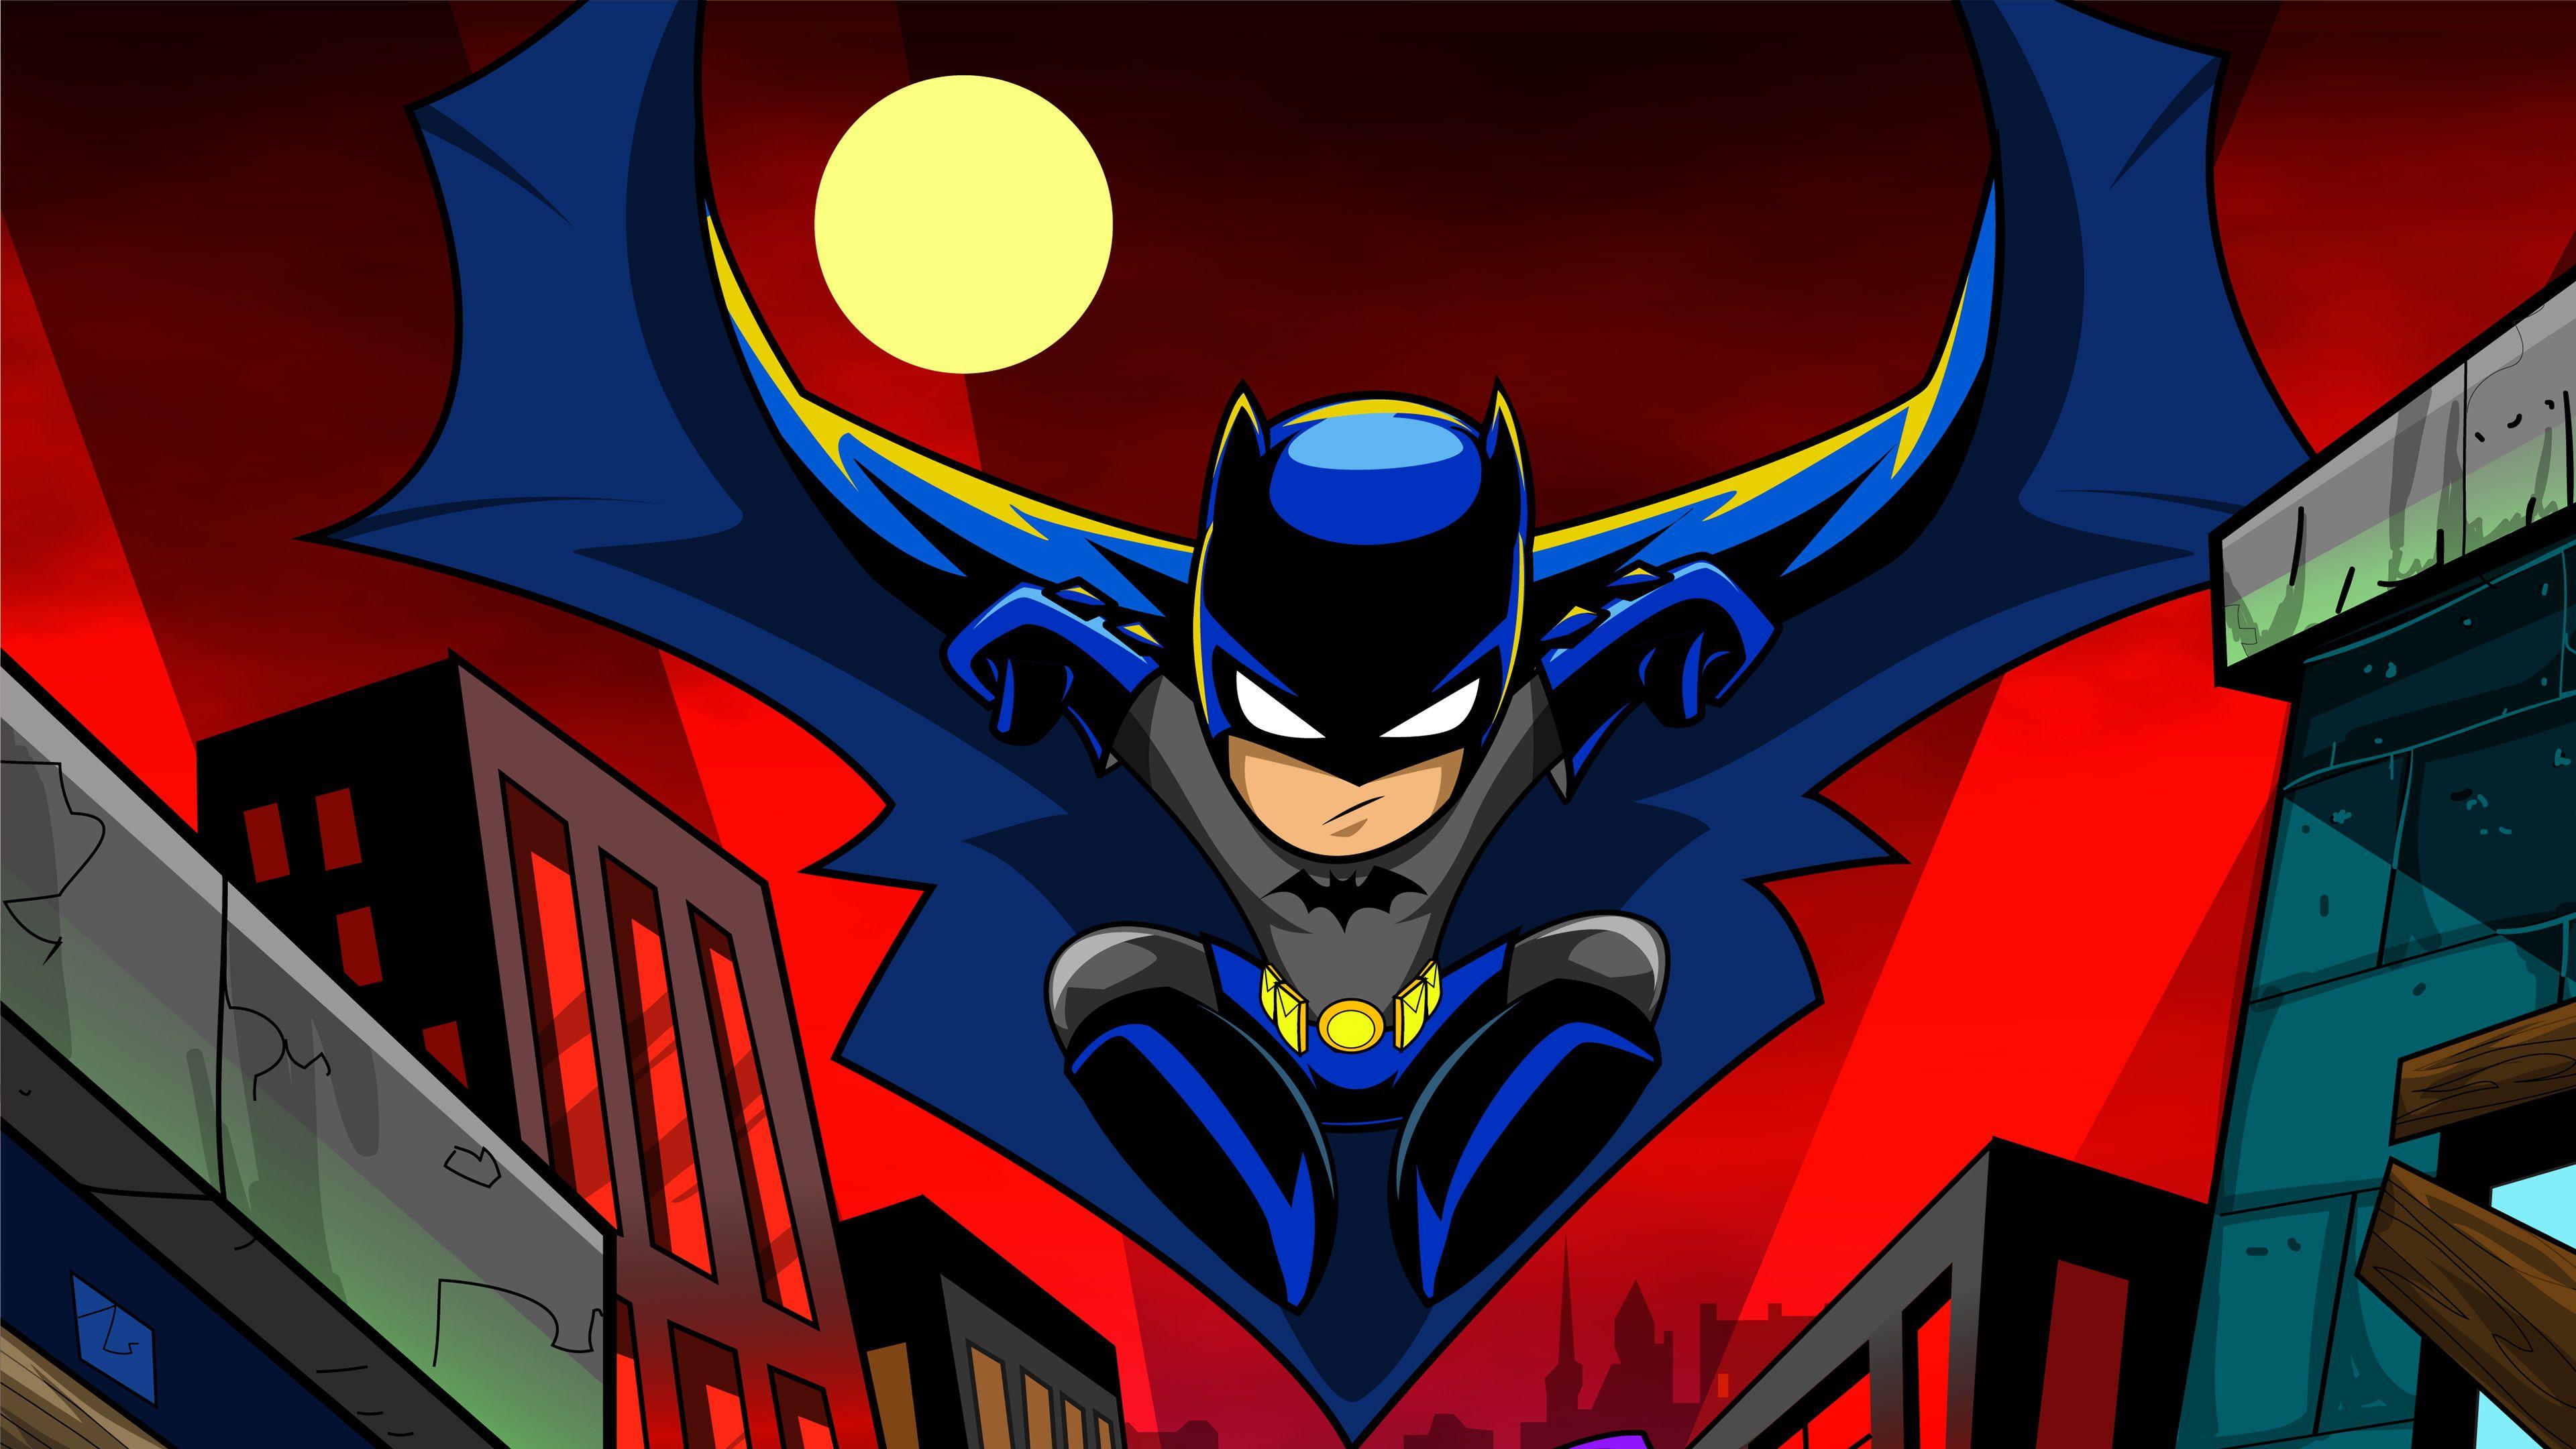 Batman Cartoon Art 4k Superheroes Wallpapers Hd Wallpapers Digital Art Wallpapers Cartoon Wallpapers B Cartoon Wallpaper Hd Batman Cartoon Batman Wallpaper